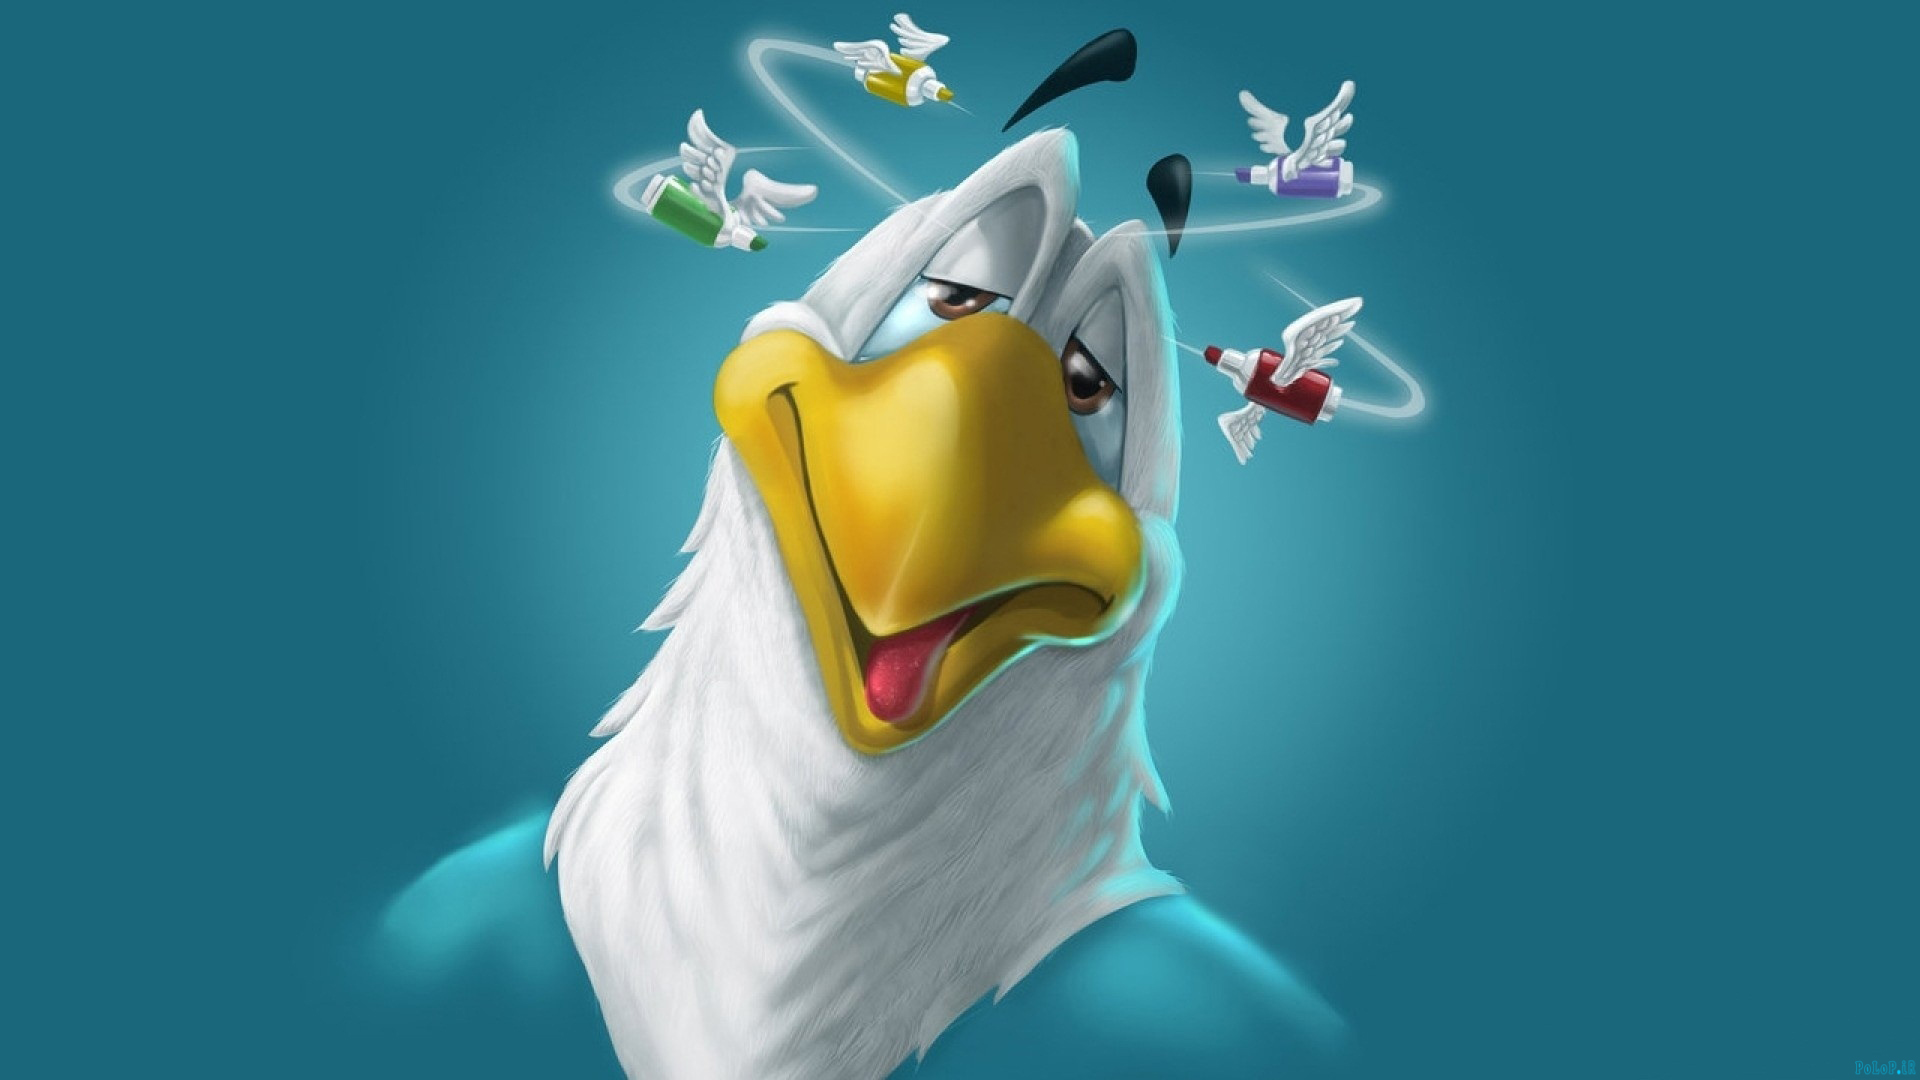 http://polop.persiangig.com/wallpaper/Humor_cartoon_313051(polop.ir).jpg